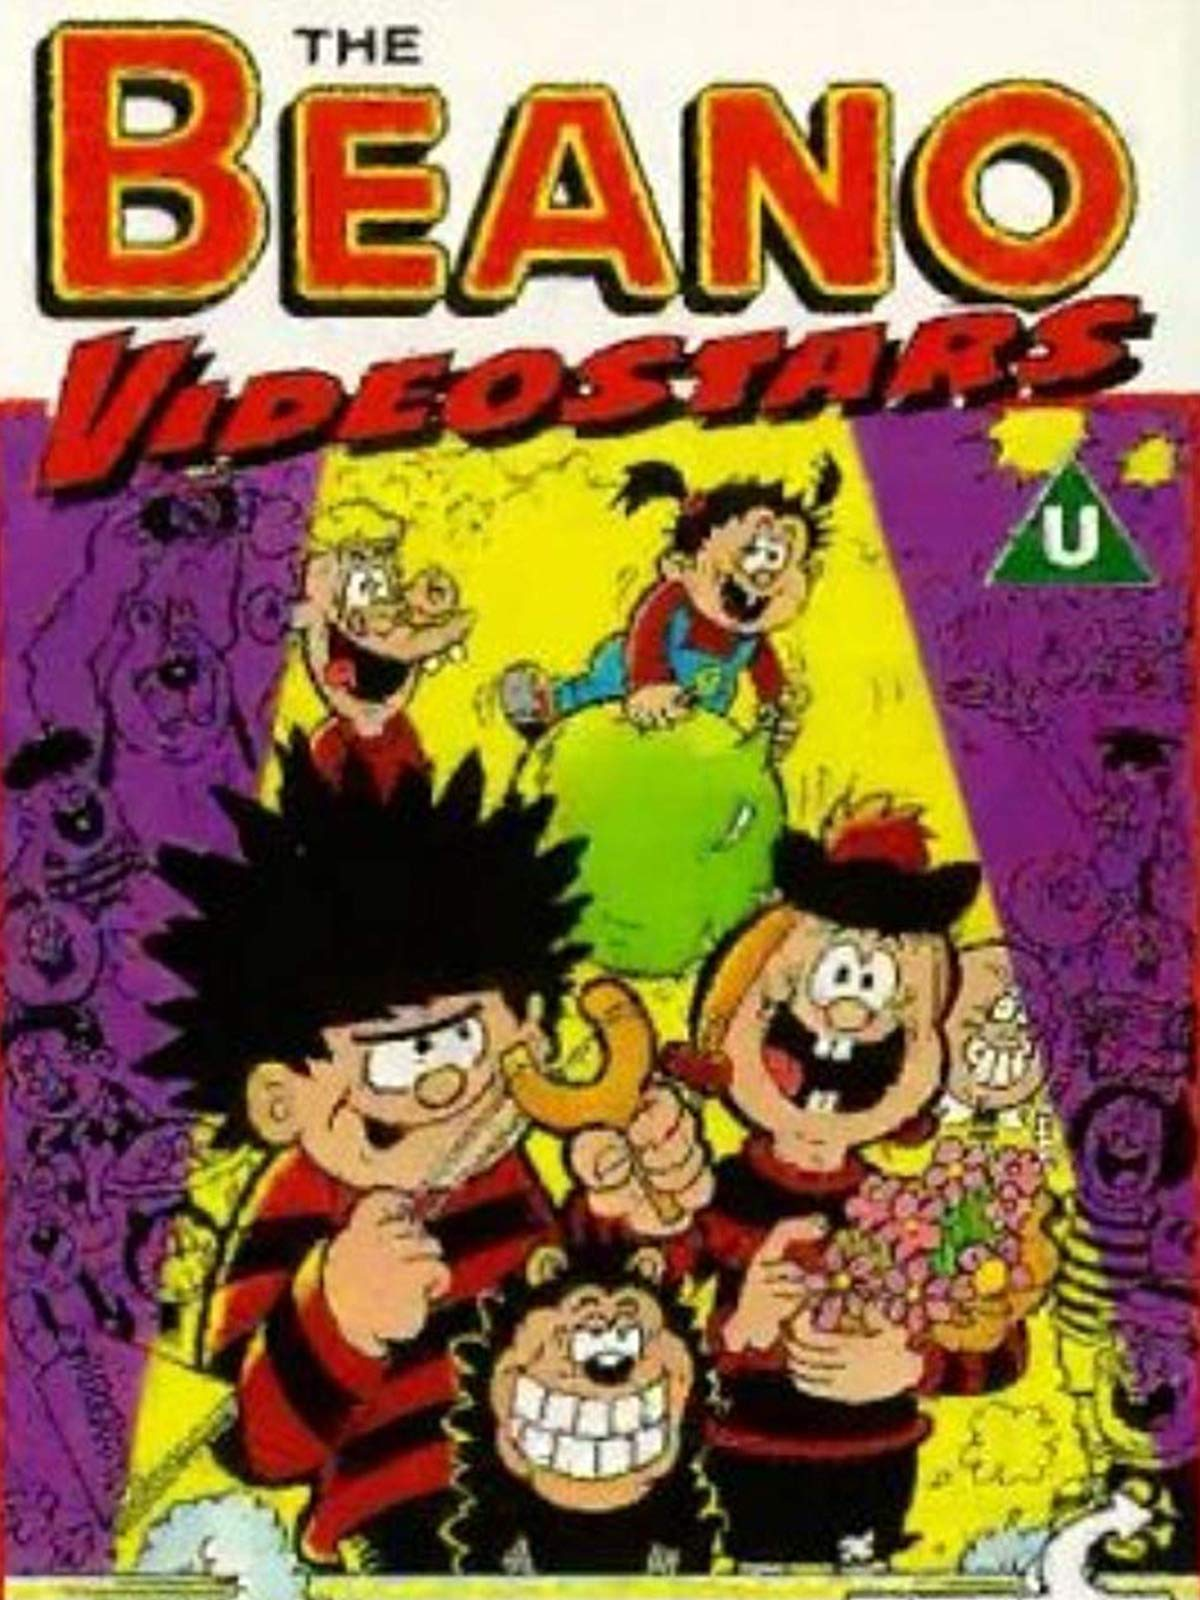 The Beano VideoStars